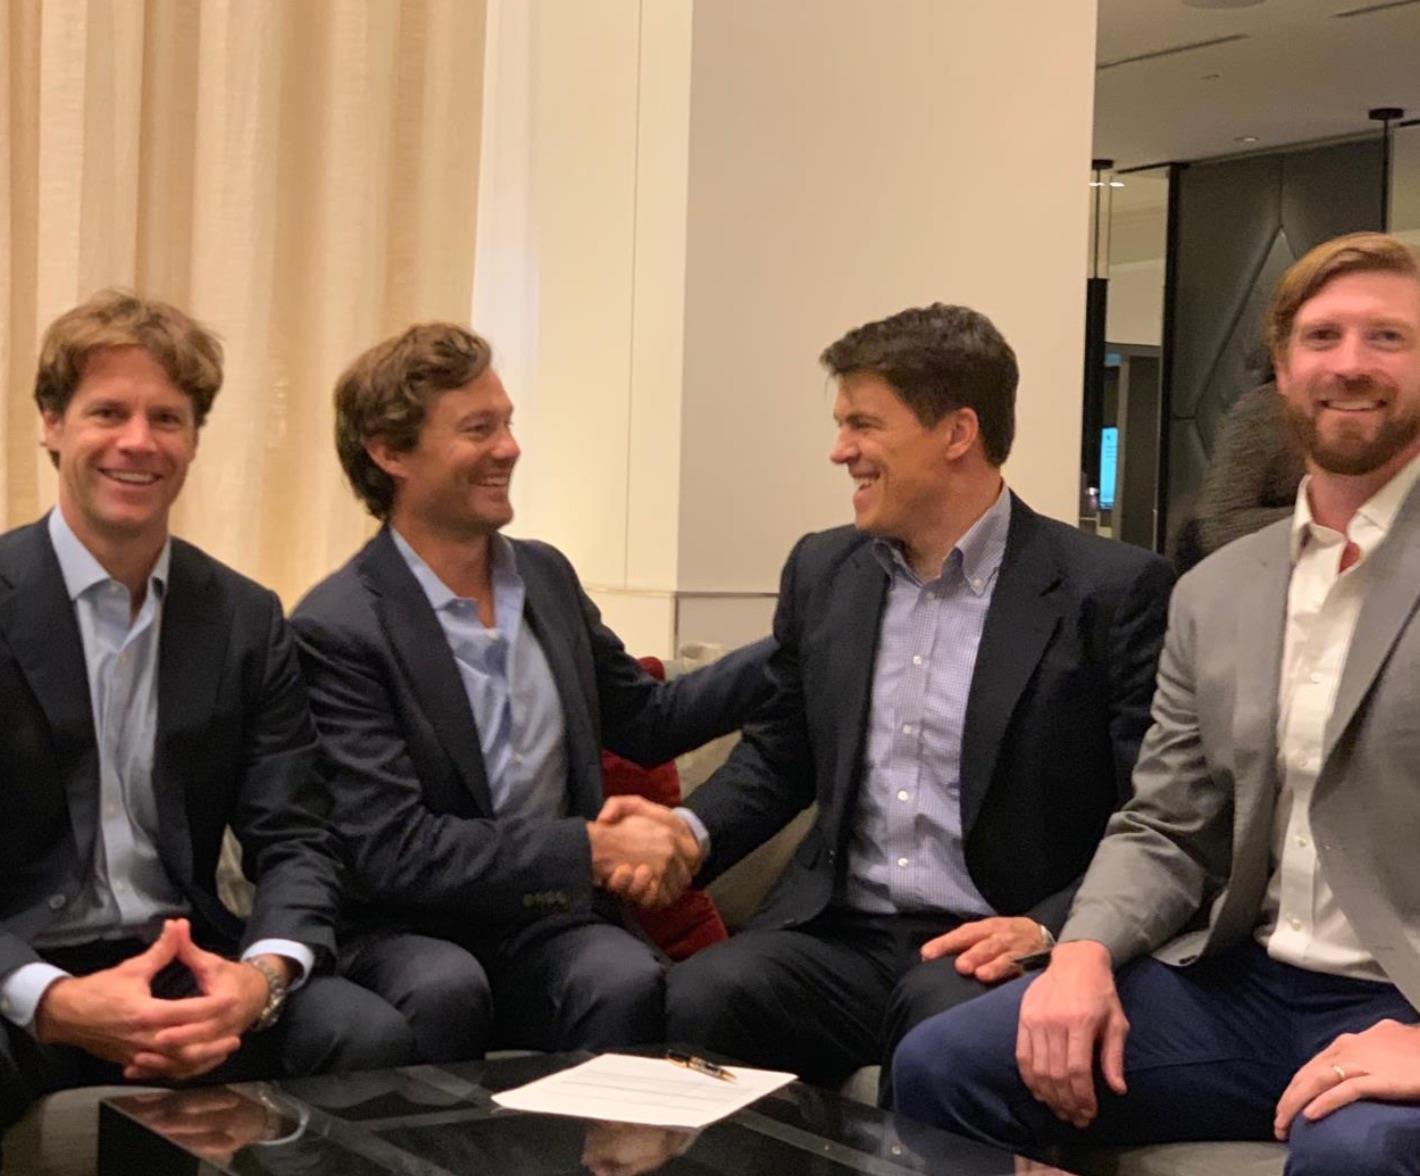 From left to right: Bradley Neuberth, Volckert van Reesema, Matthias Müller and Pace Ralli